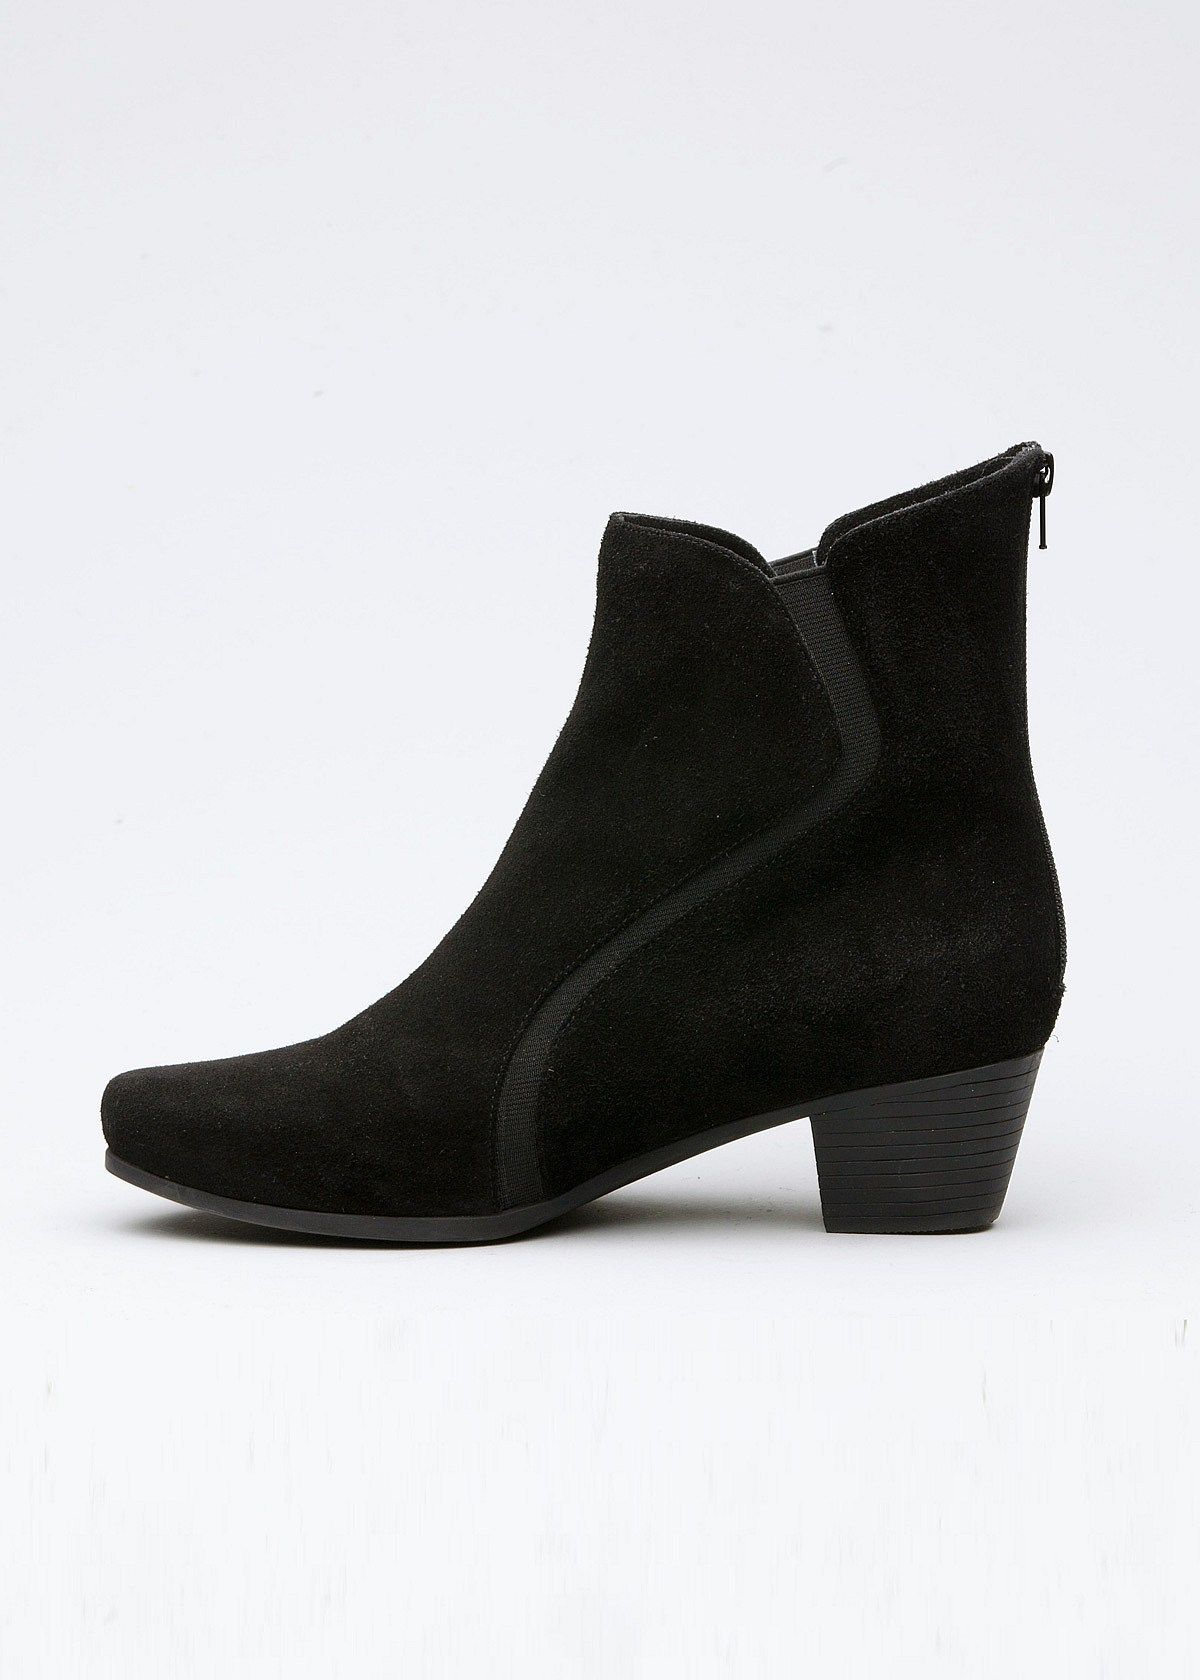 women shoes, Plus size womens clothing